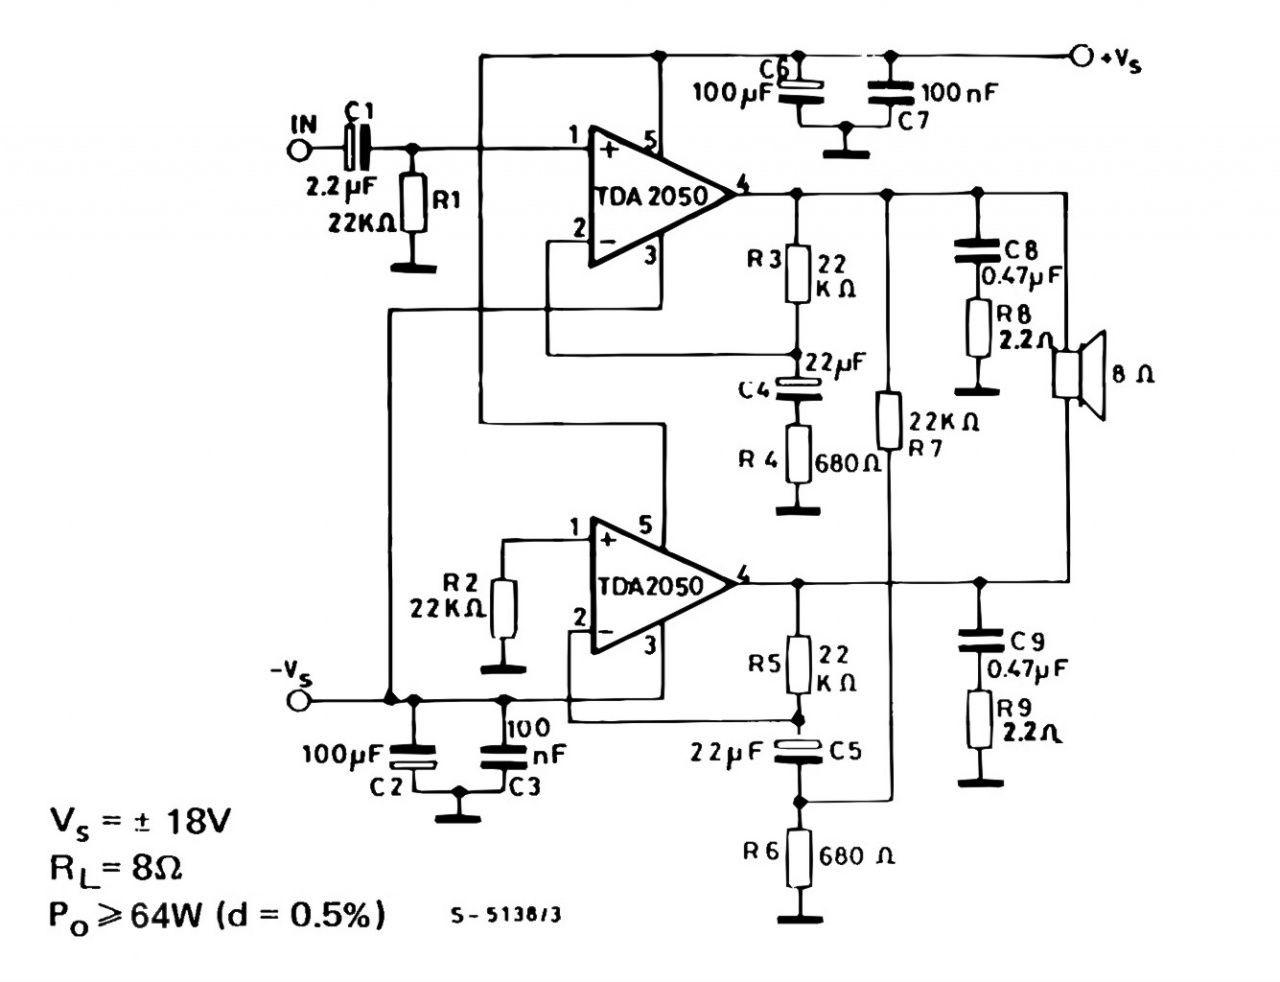 tda2050 bridge amplifier circuit Google Search